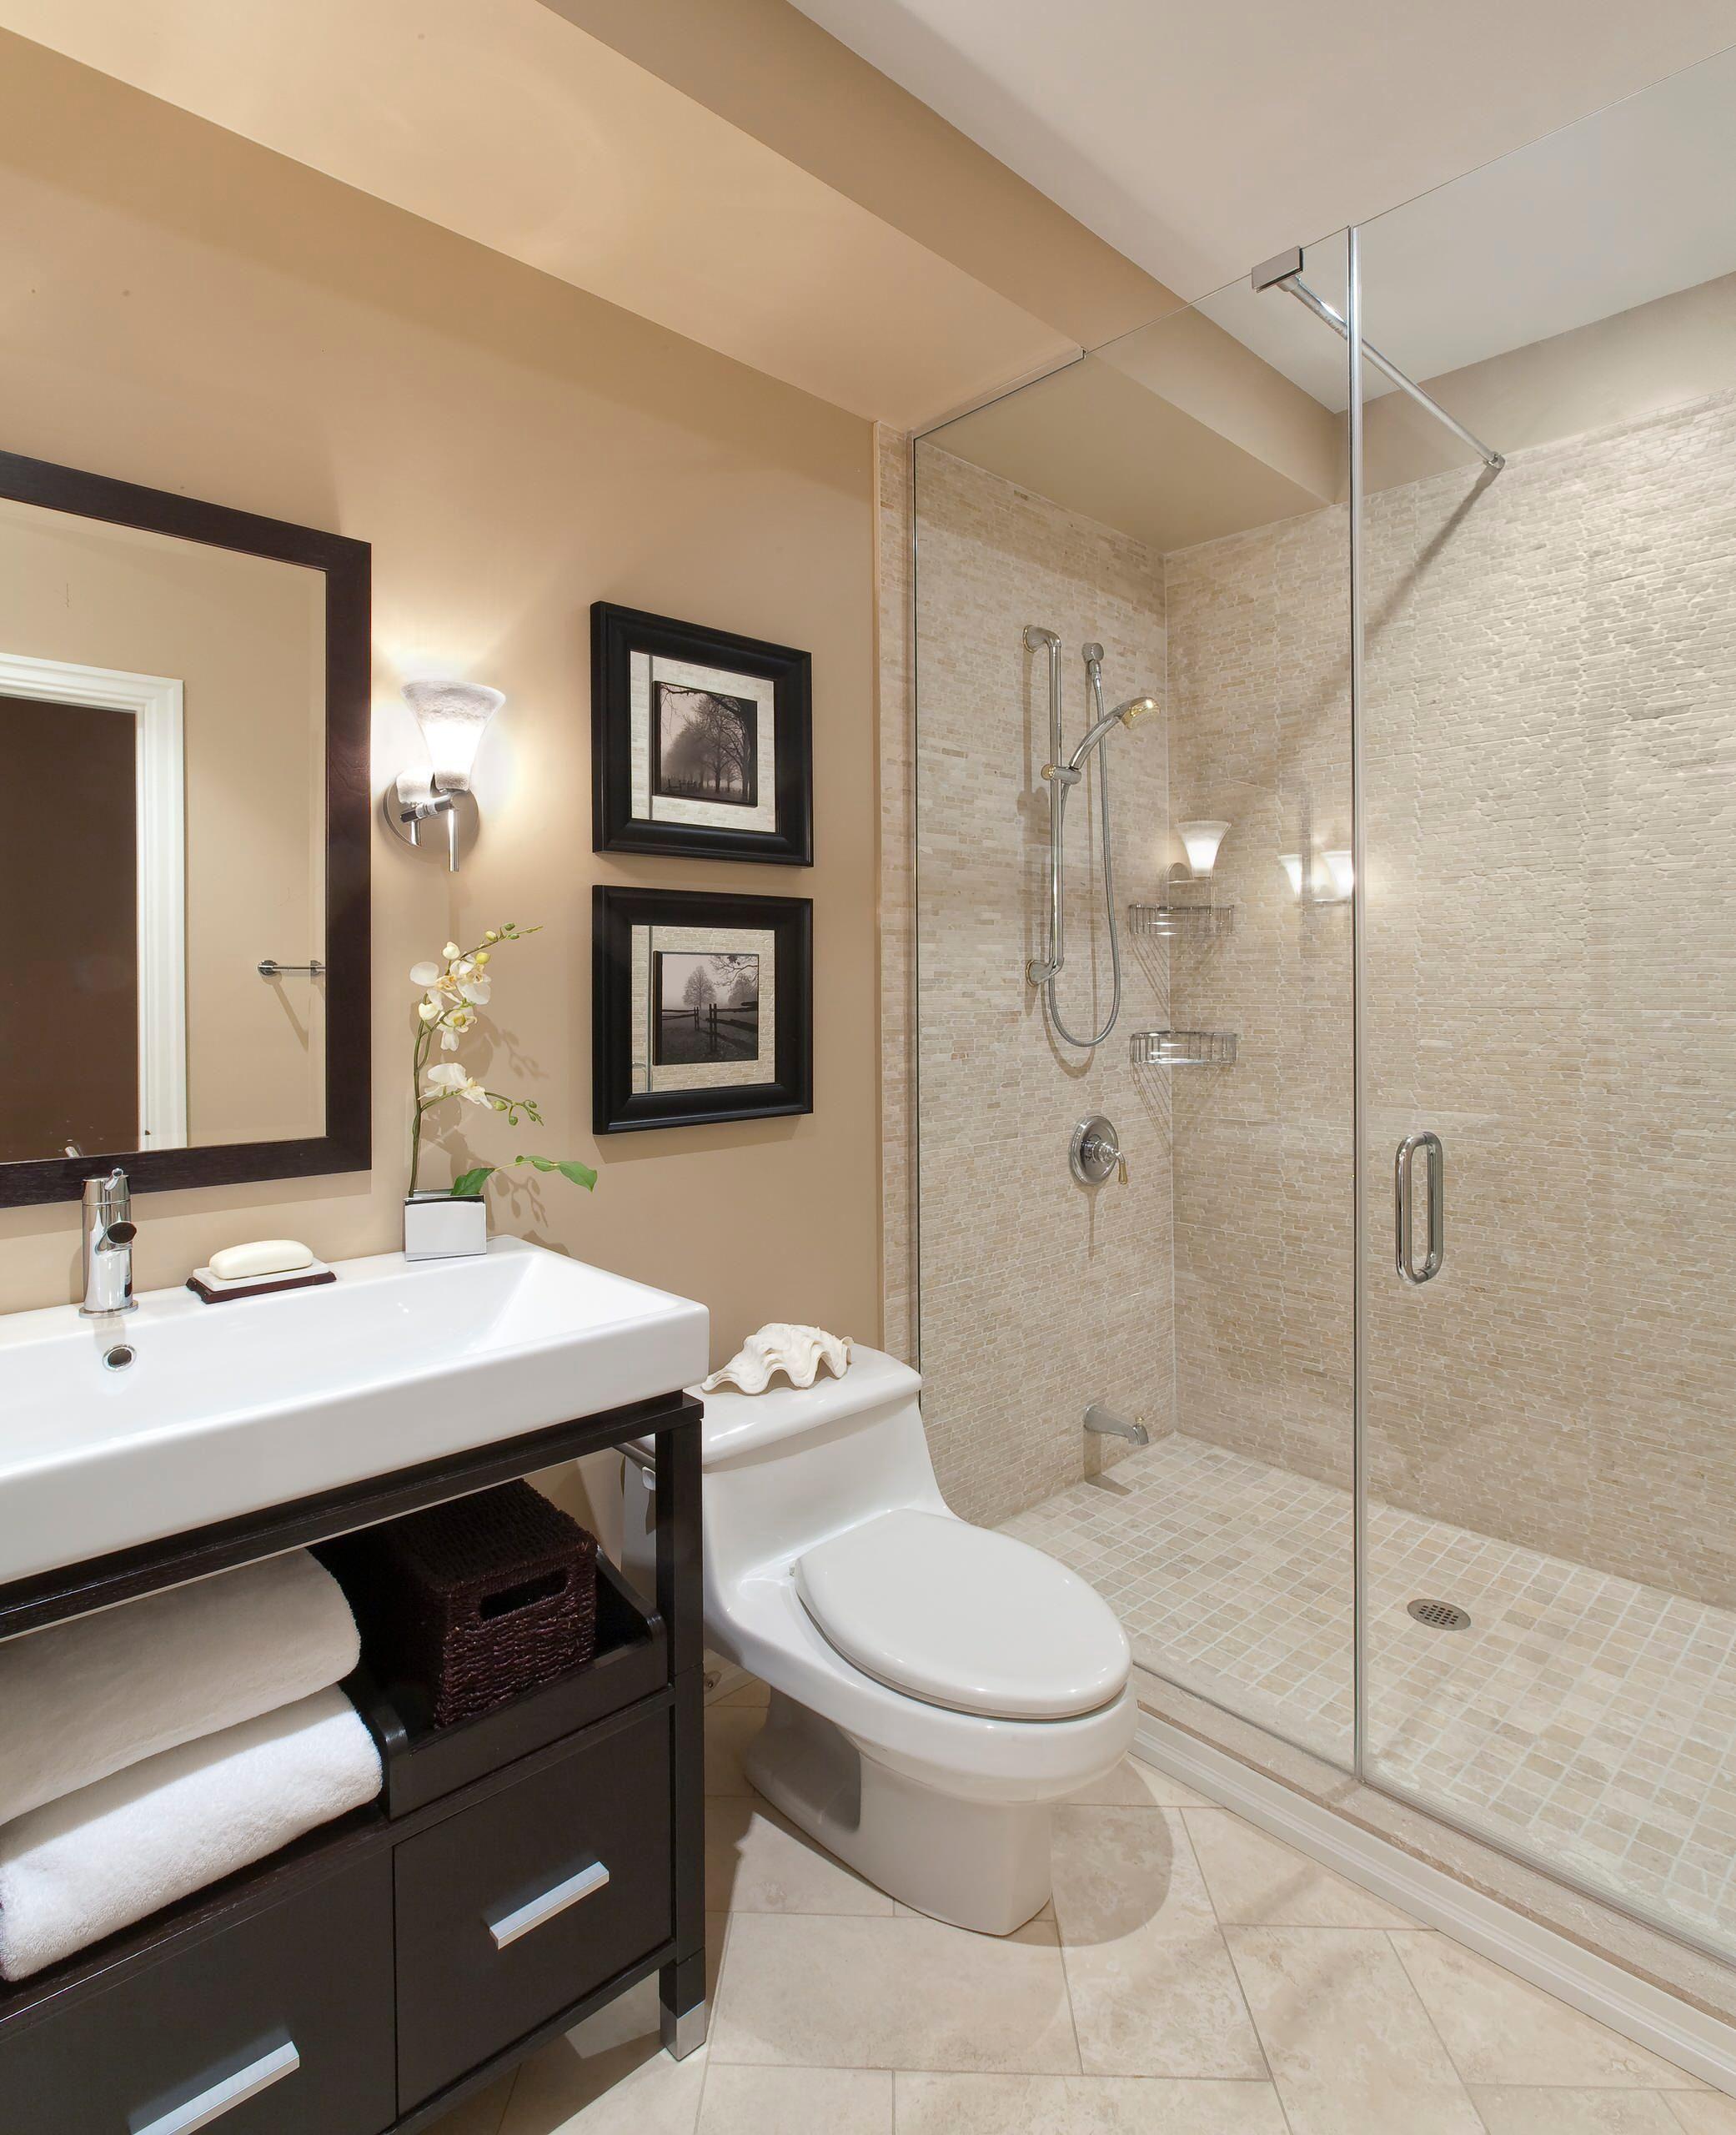 glass shower door  Small Bathroom Remodel ideas  Pinterest